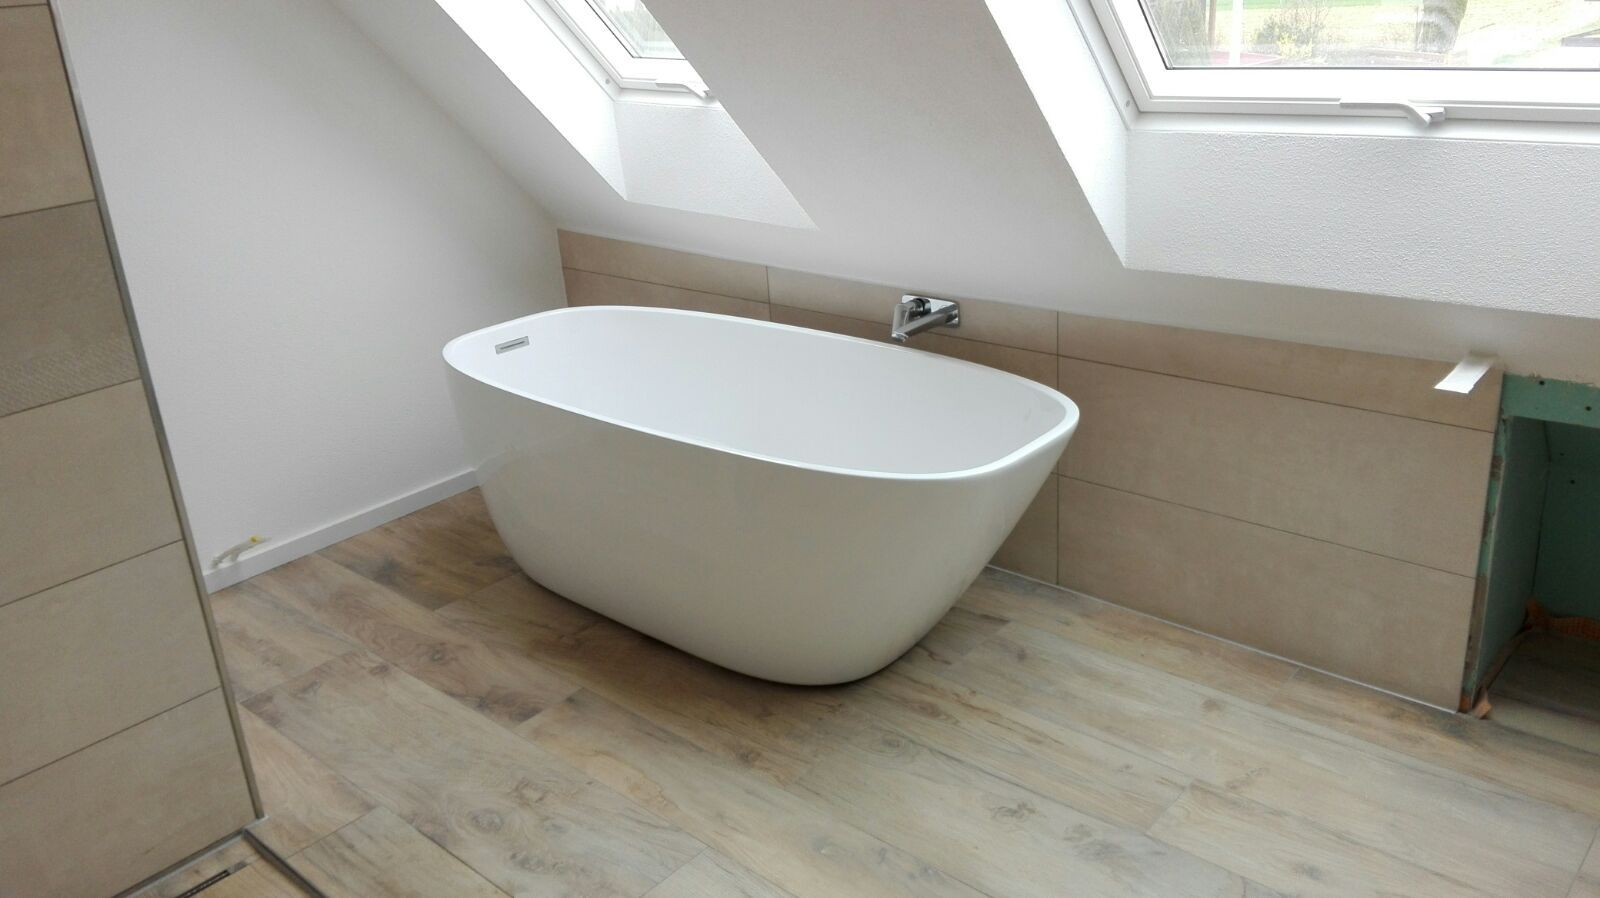 Bathroom Idea Attic Room Small Space Badezimmer Idee Dachschrage